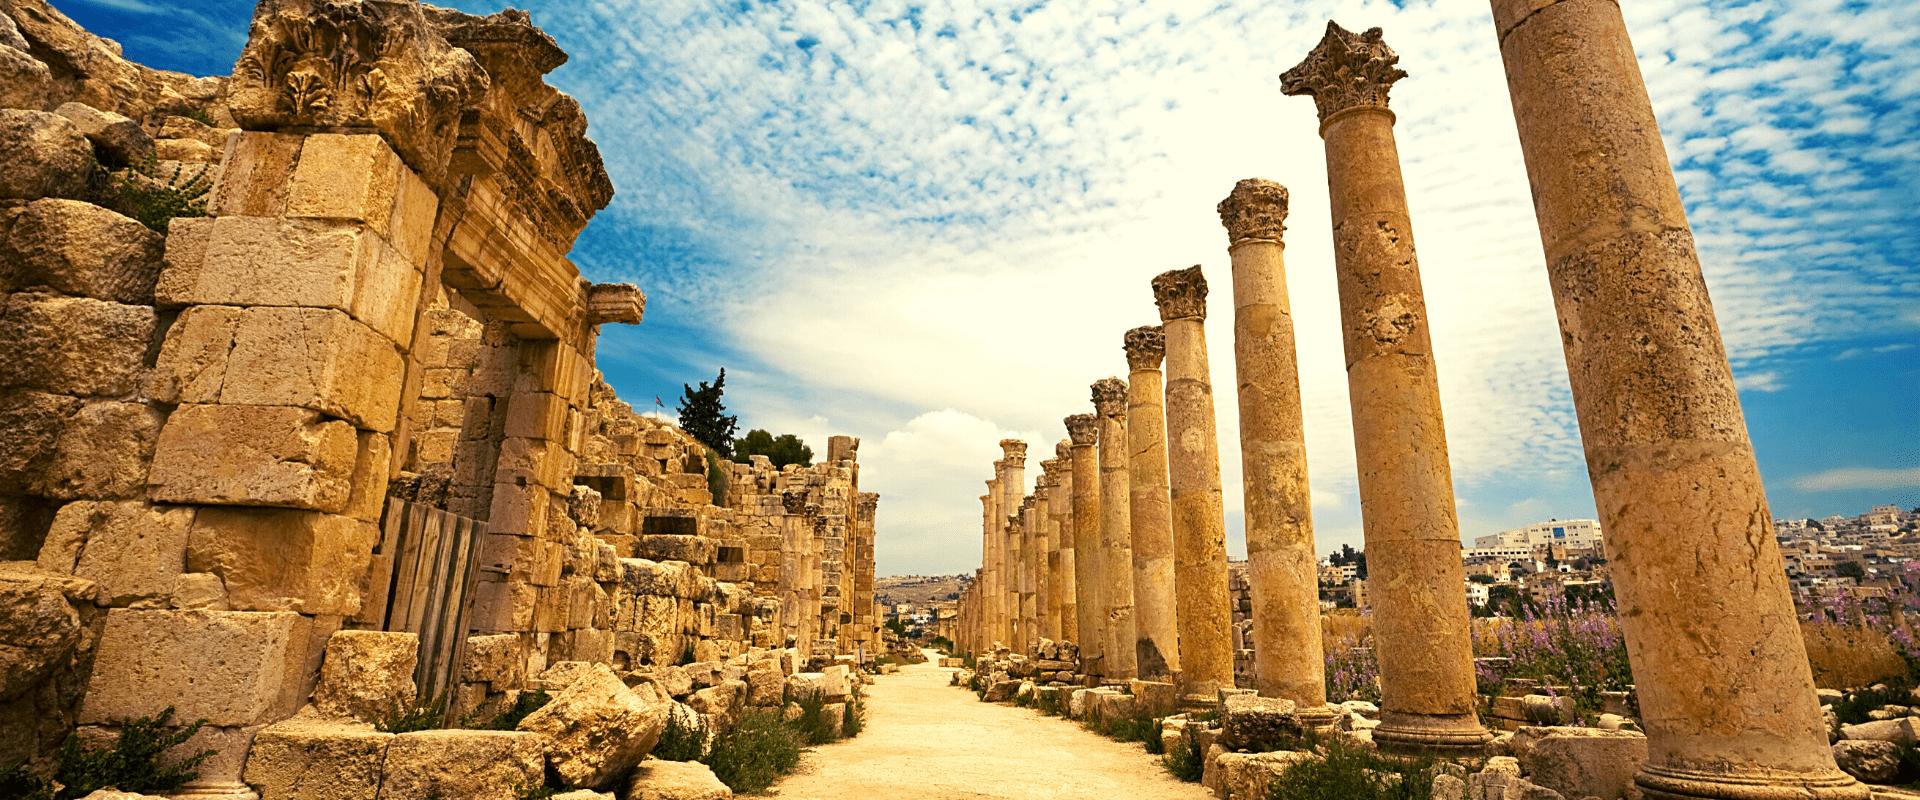 Heartland of Israel Tour